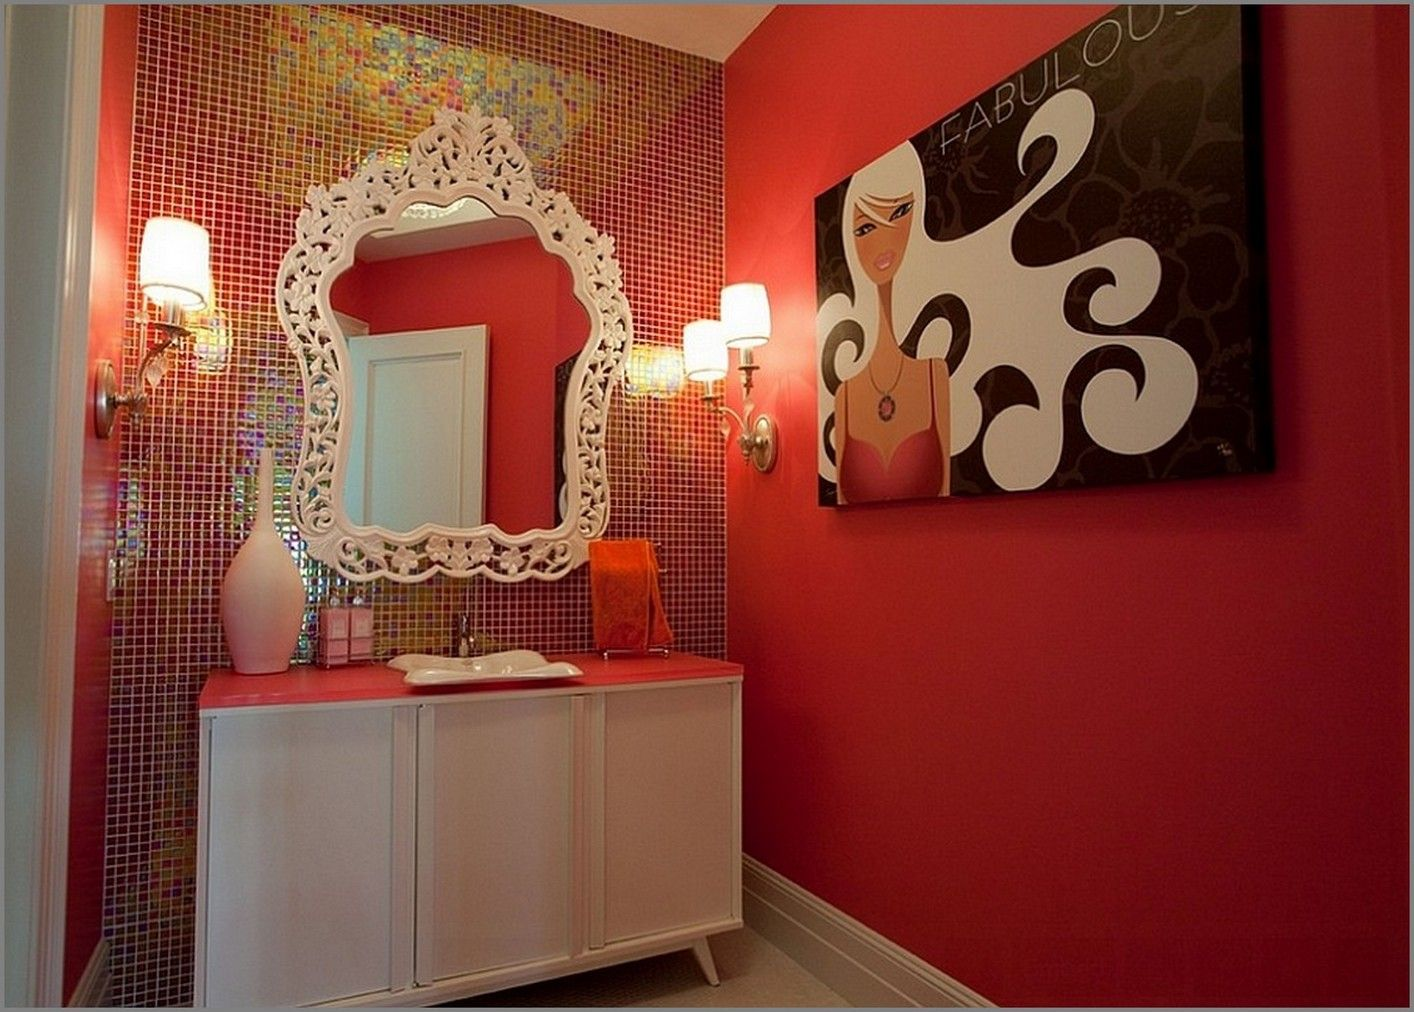 Bathroom Decorating Ideas Mirror: Red Color Interior Design Ideas